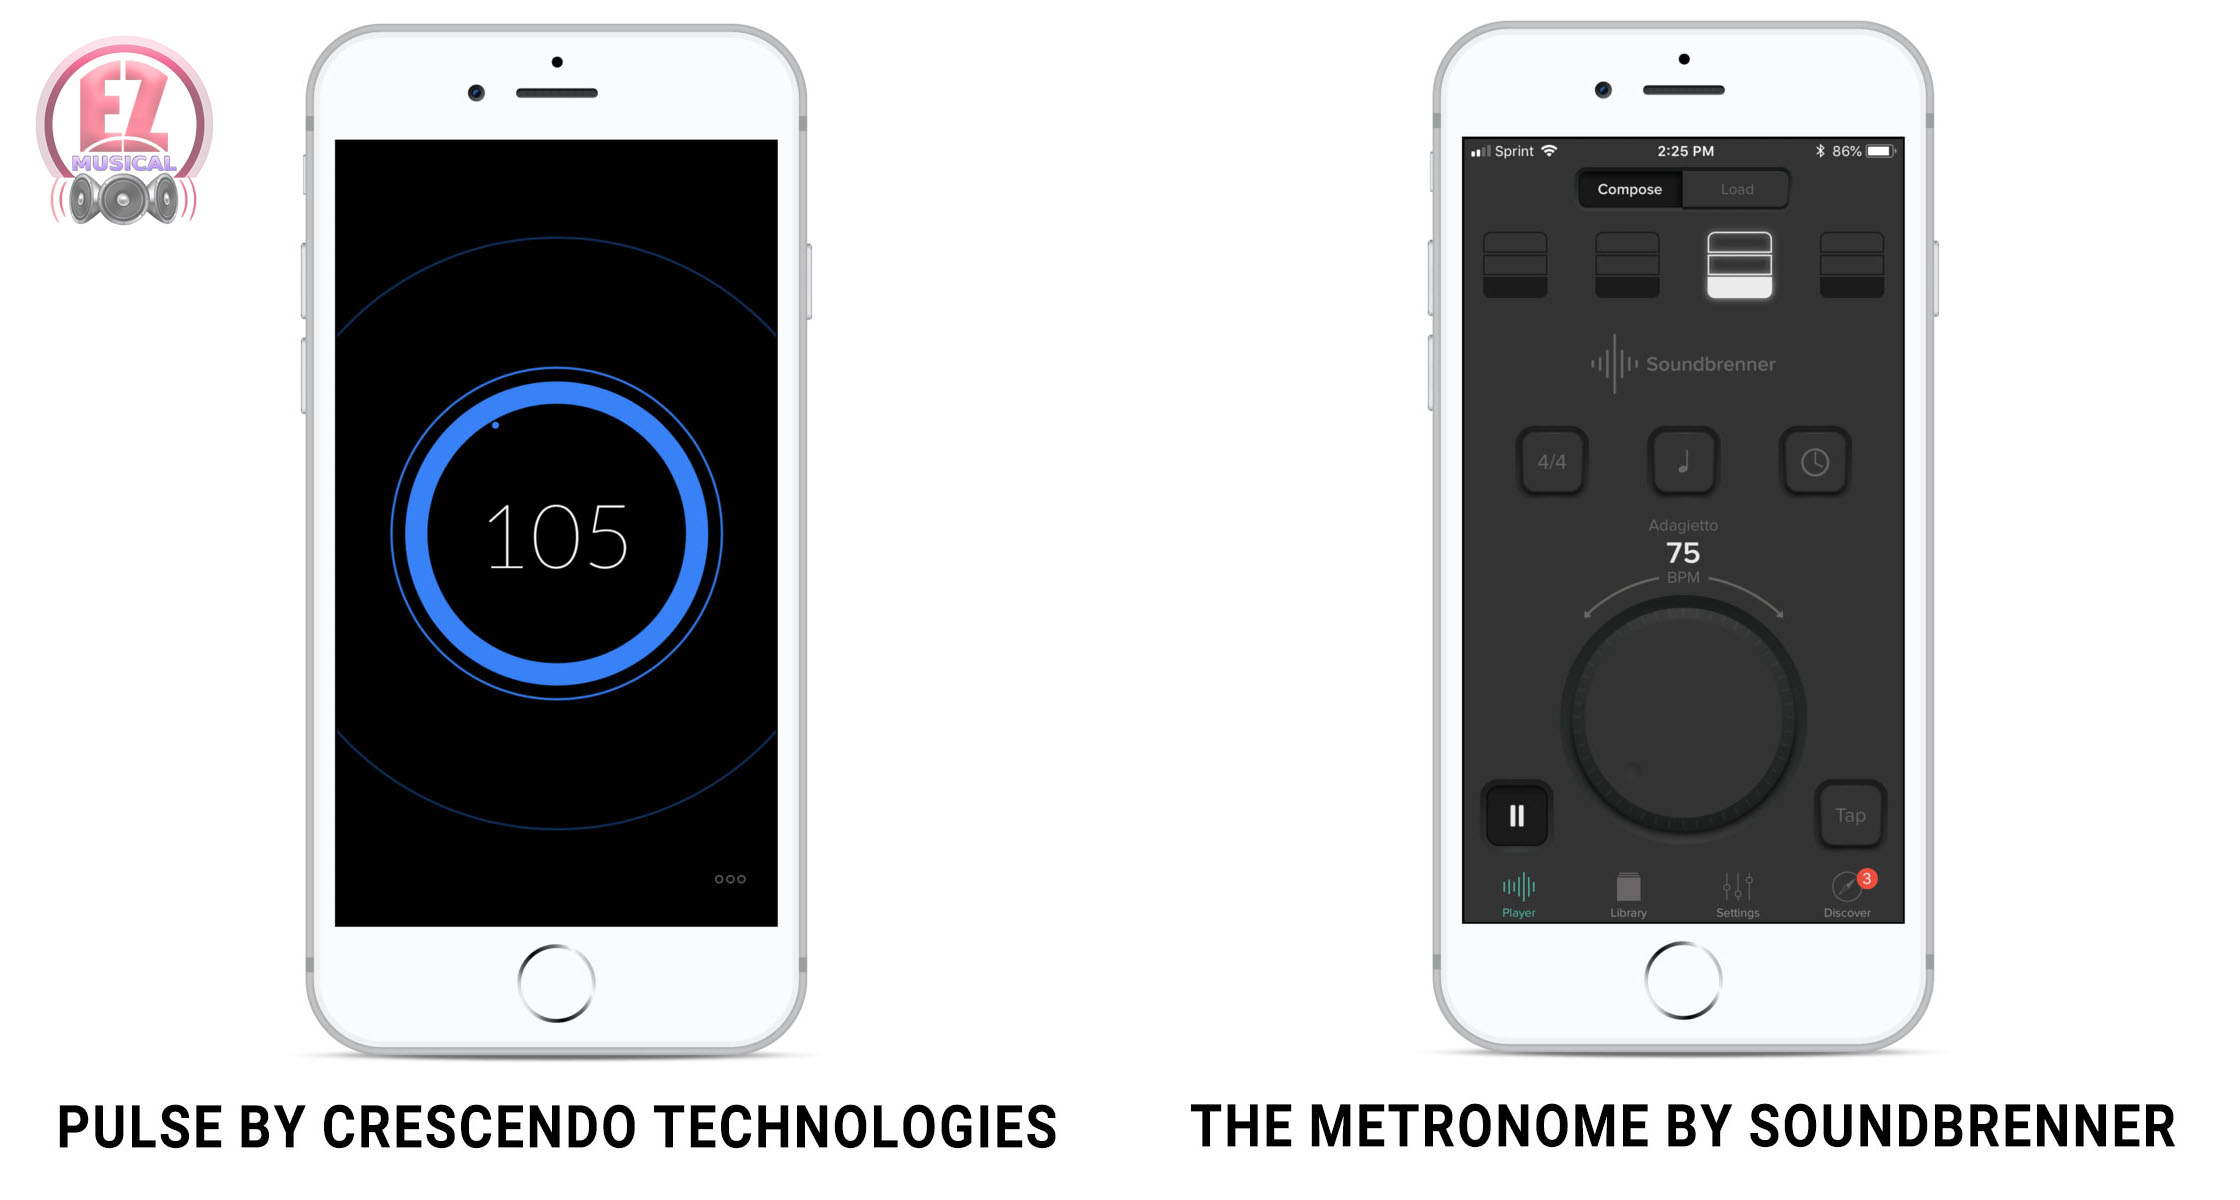 Metronome app 2 مترونوم چیست